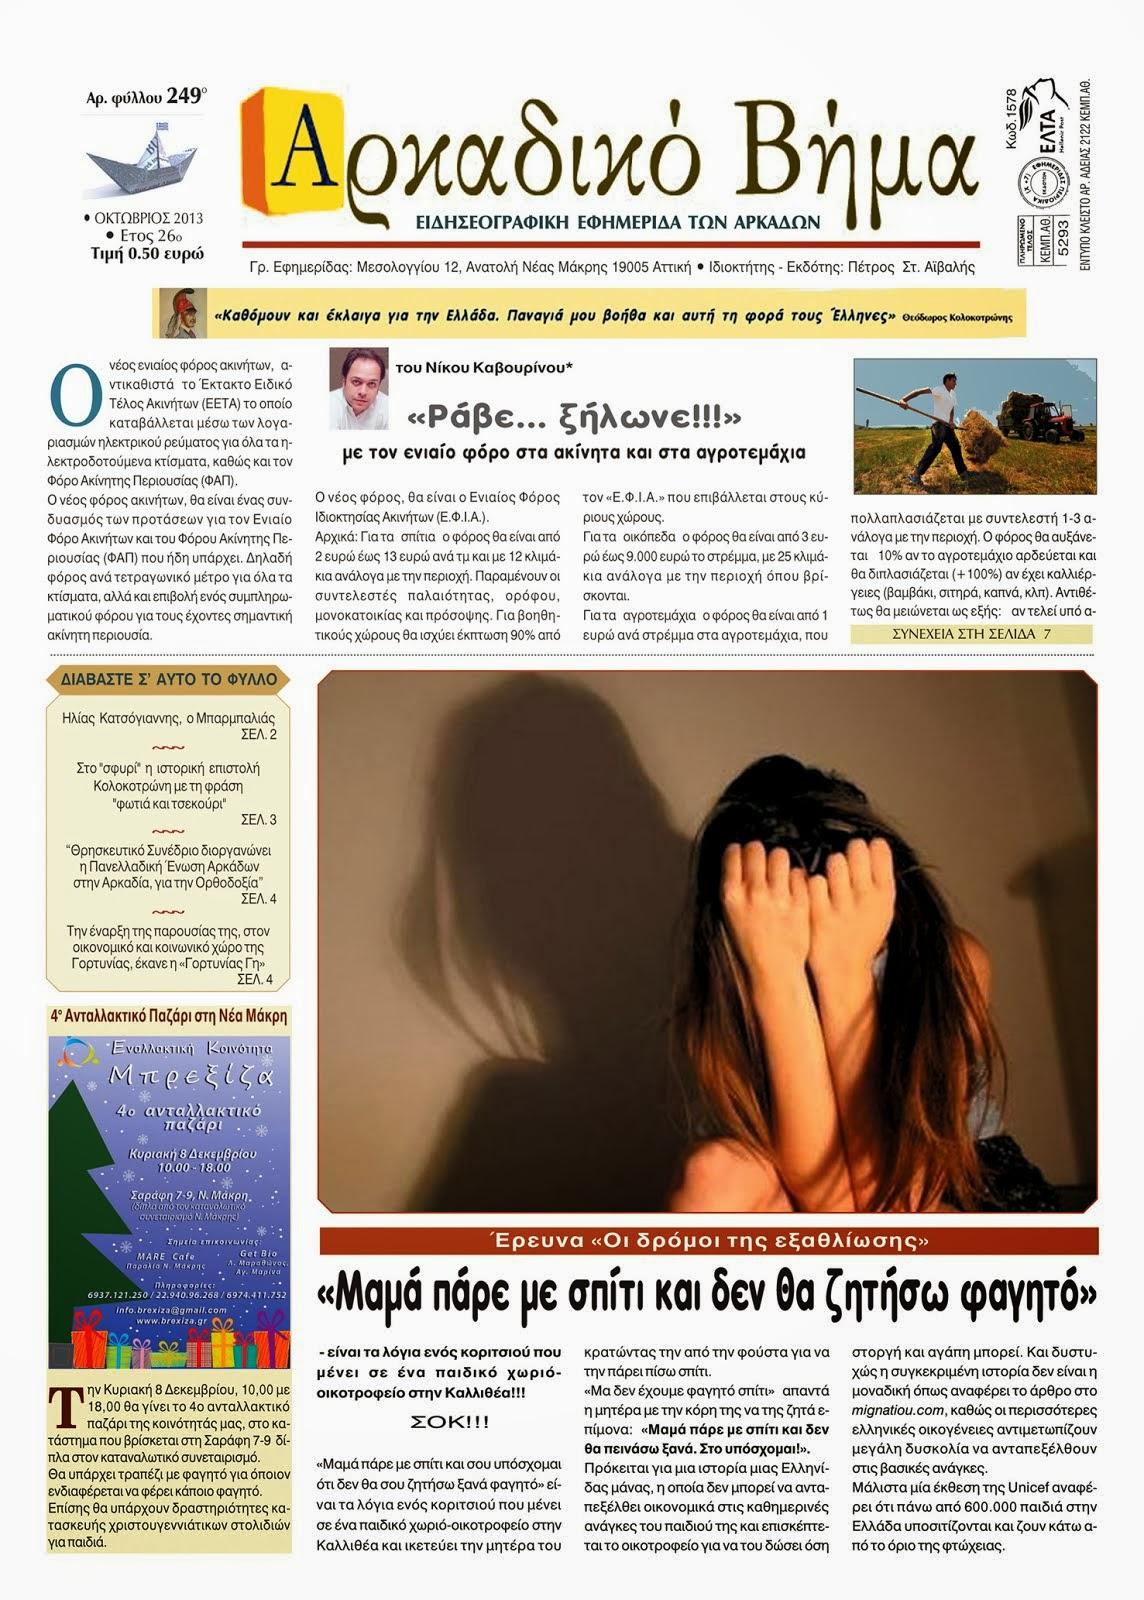 AΡΚΑΔΙΚΟ ΒΗΜΑ-online.gr: Βγάζουν στο σφυρί 100.000 κατοικίες!